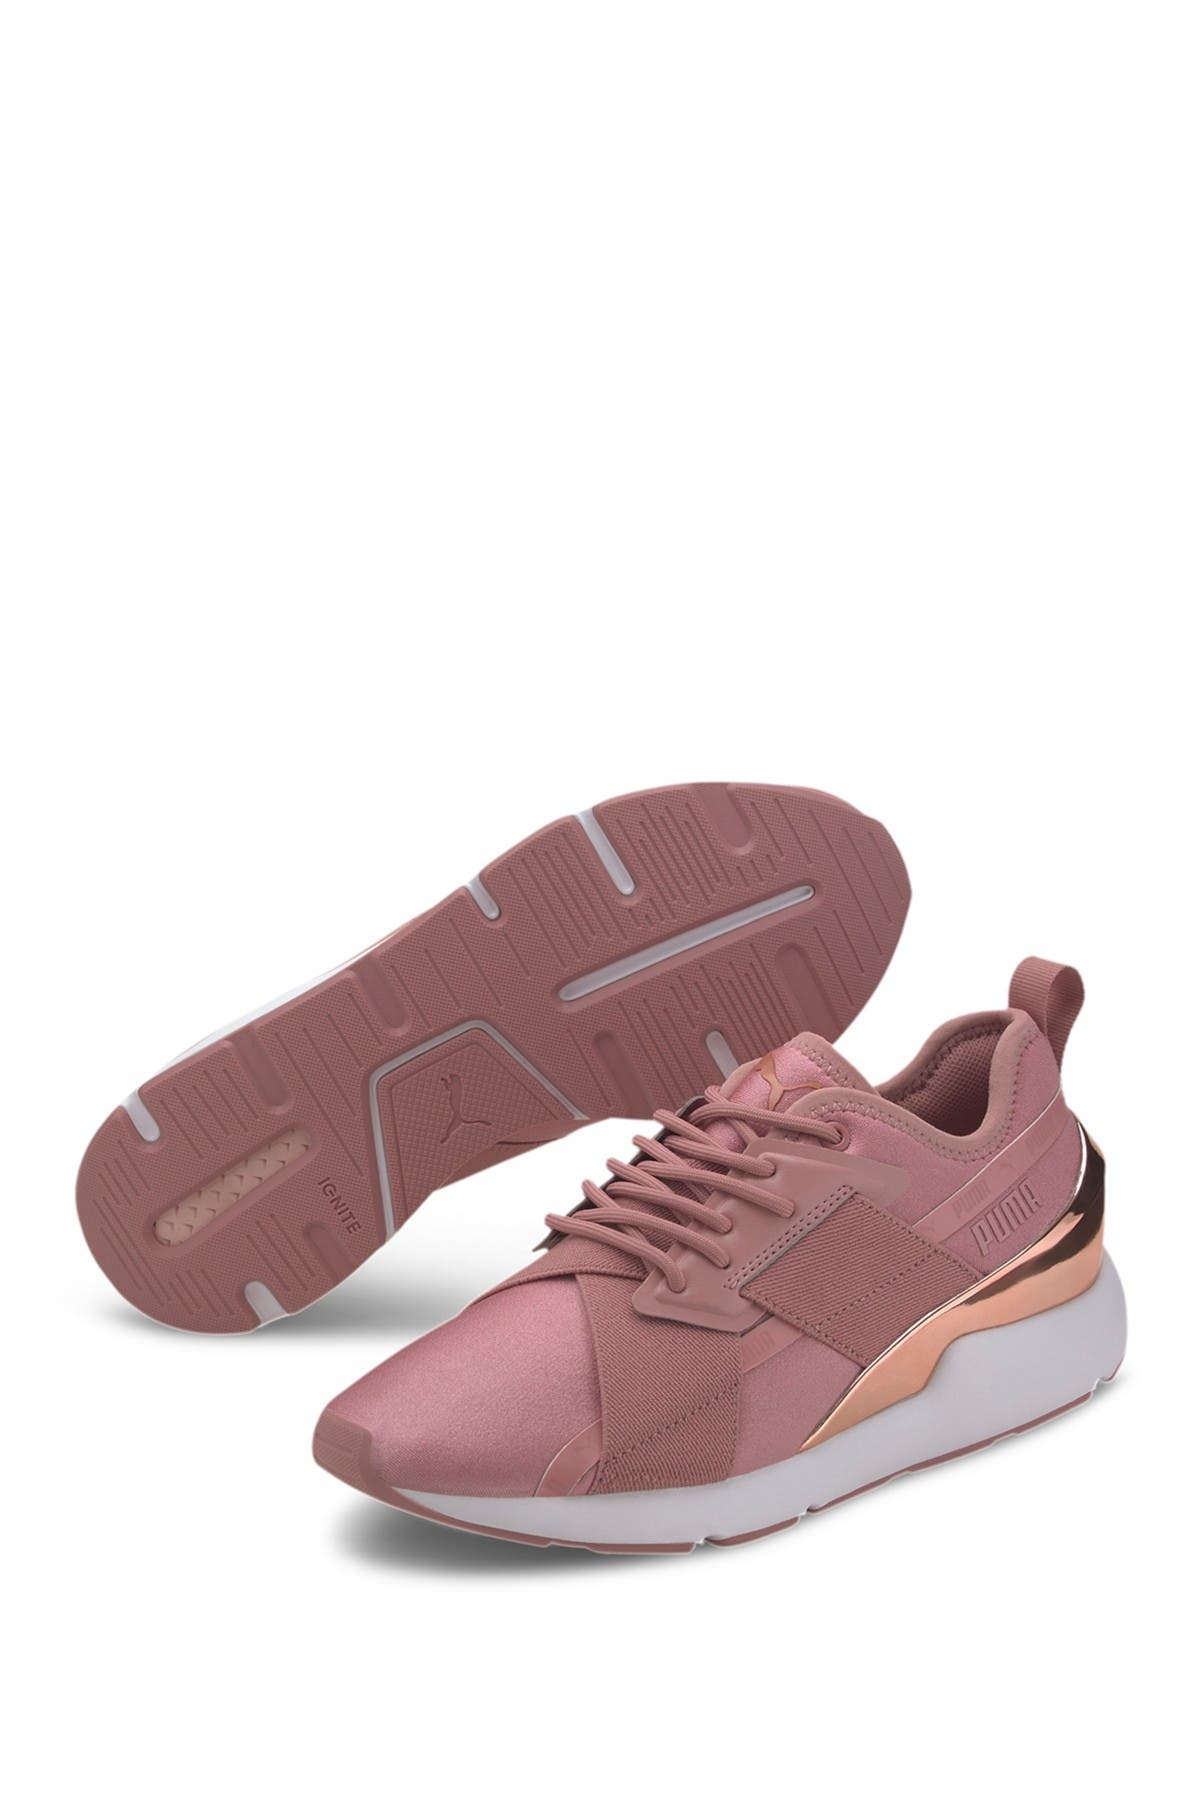 Image of PUMA Muse X-2 Metallic Sneaker